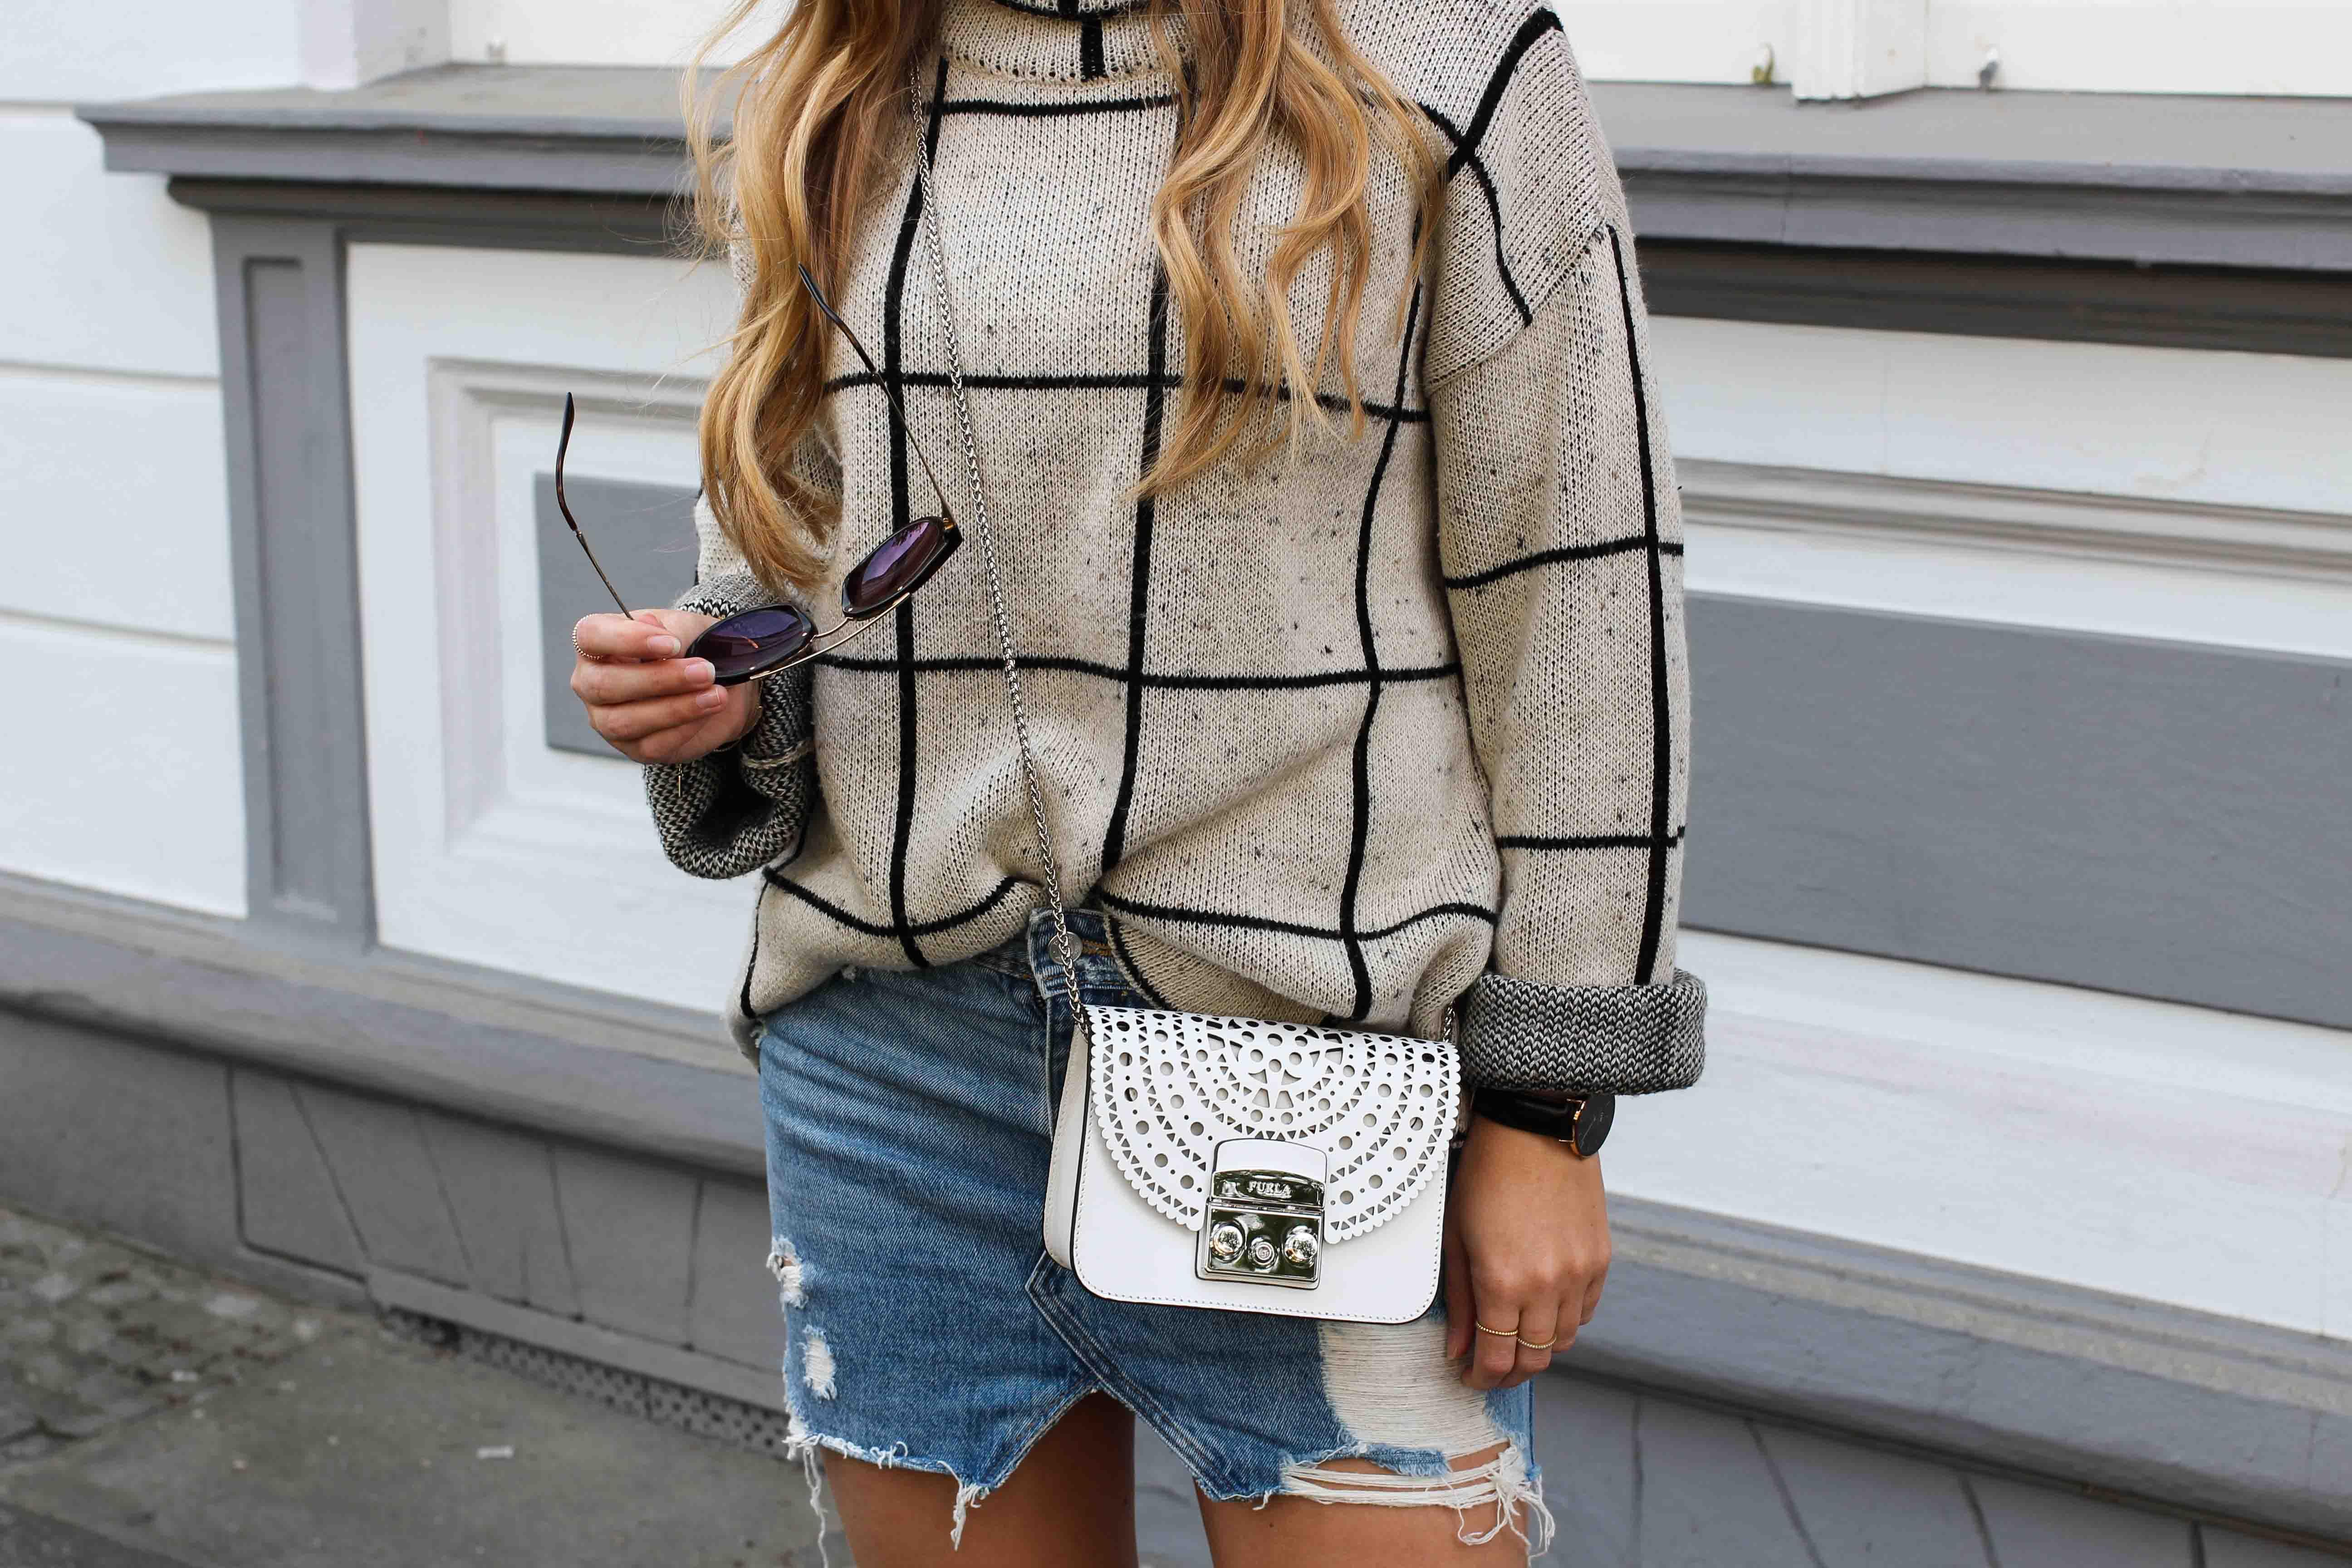 Prada Sonnenbrille Gold Jeansrock kombinieren Sommertasche Furla Metropolis weiß Bolero Mini Crossbody Streetstyle Modeblog Bonn Outfit 9